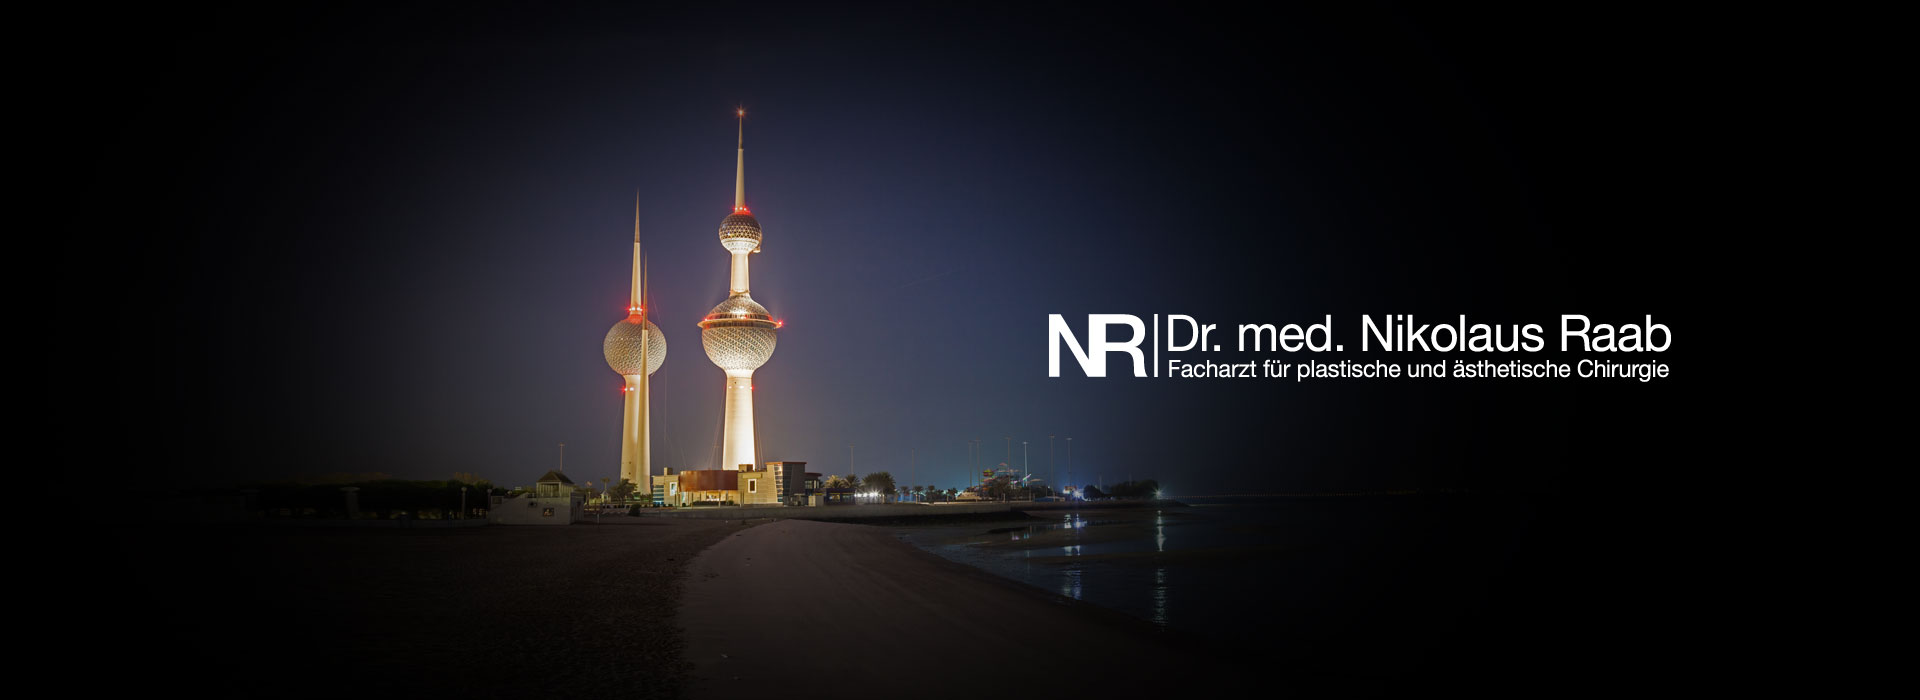 Plastic surgery Kuwait - Cosmetic surgery Kuwait - Aesthetic surgery Kuwait